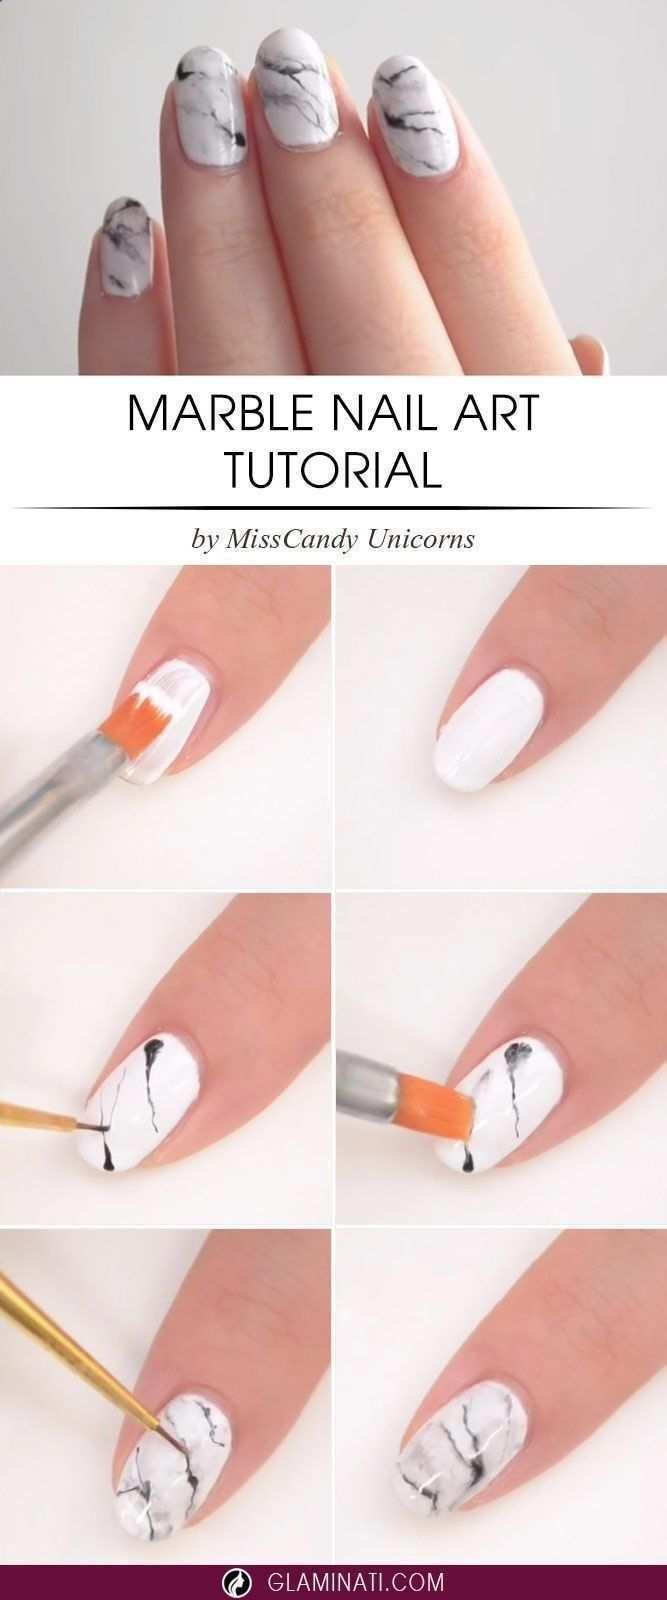 Diy Marble Nail Art Design Tutorial Step By Step Marble Nails Nailart Nails Nailart Nails Marmor Nagel Tutorial Nagel Selbstgemacht Susse Nageldesigns